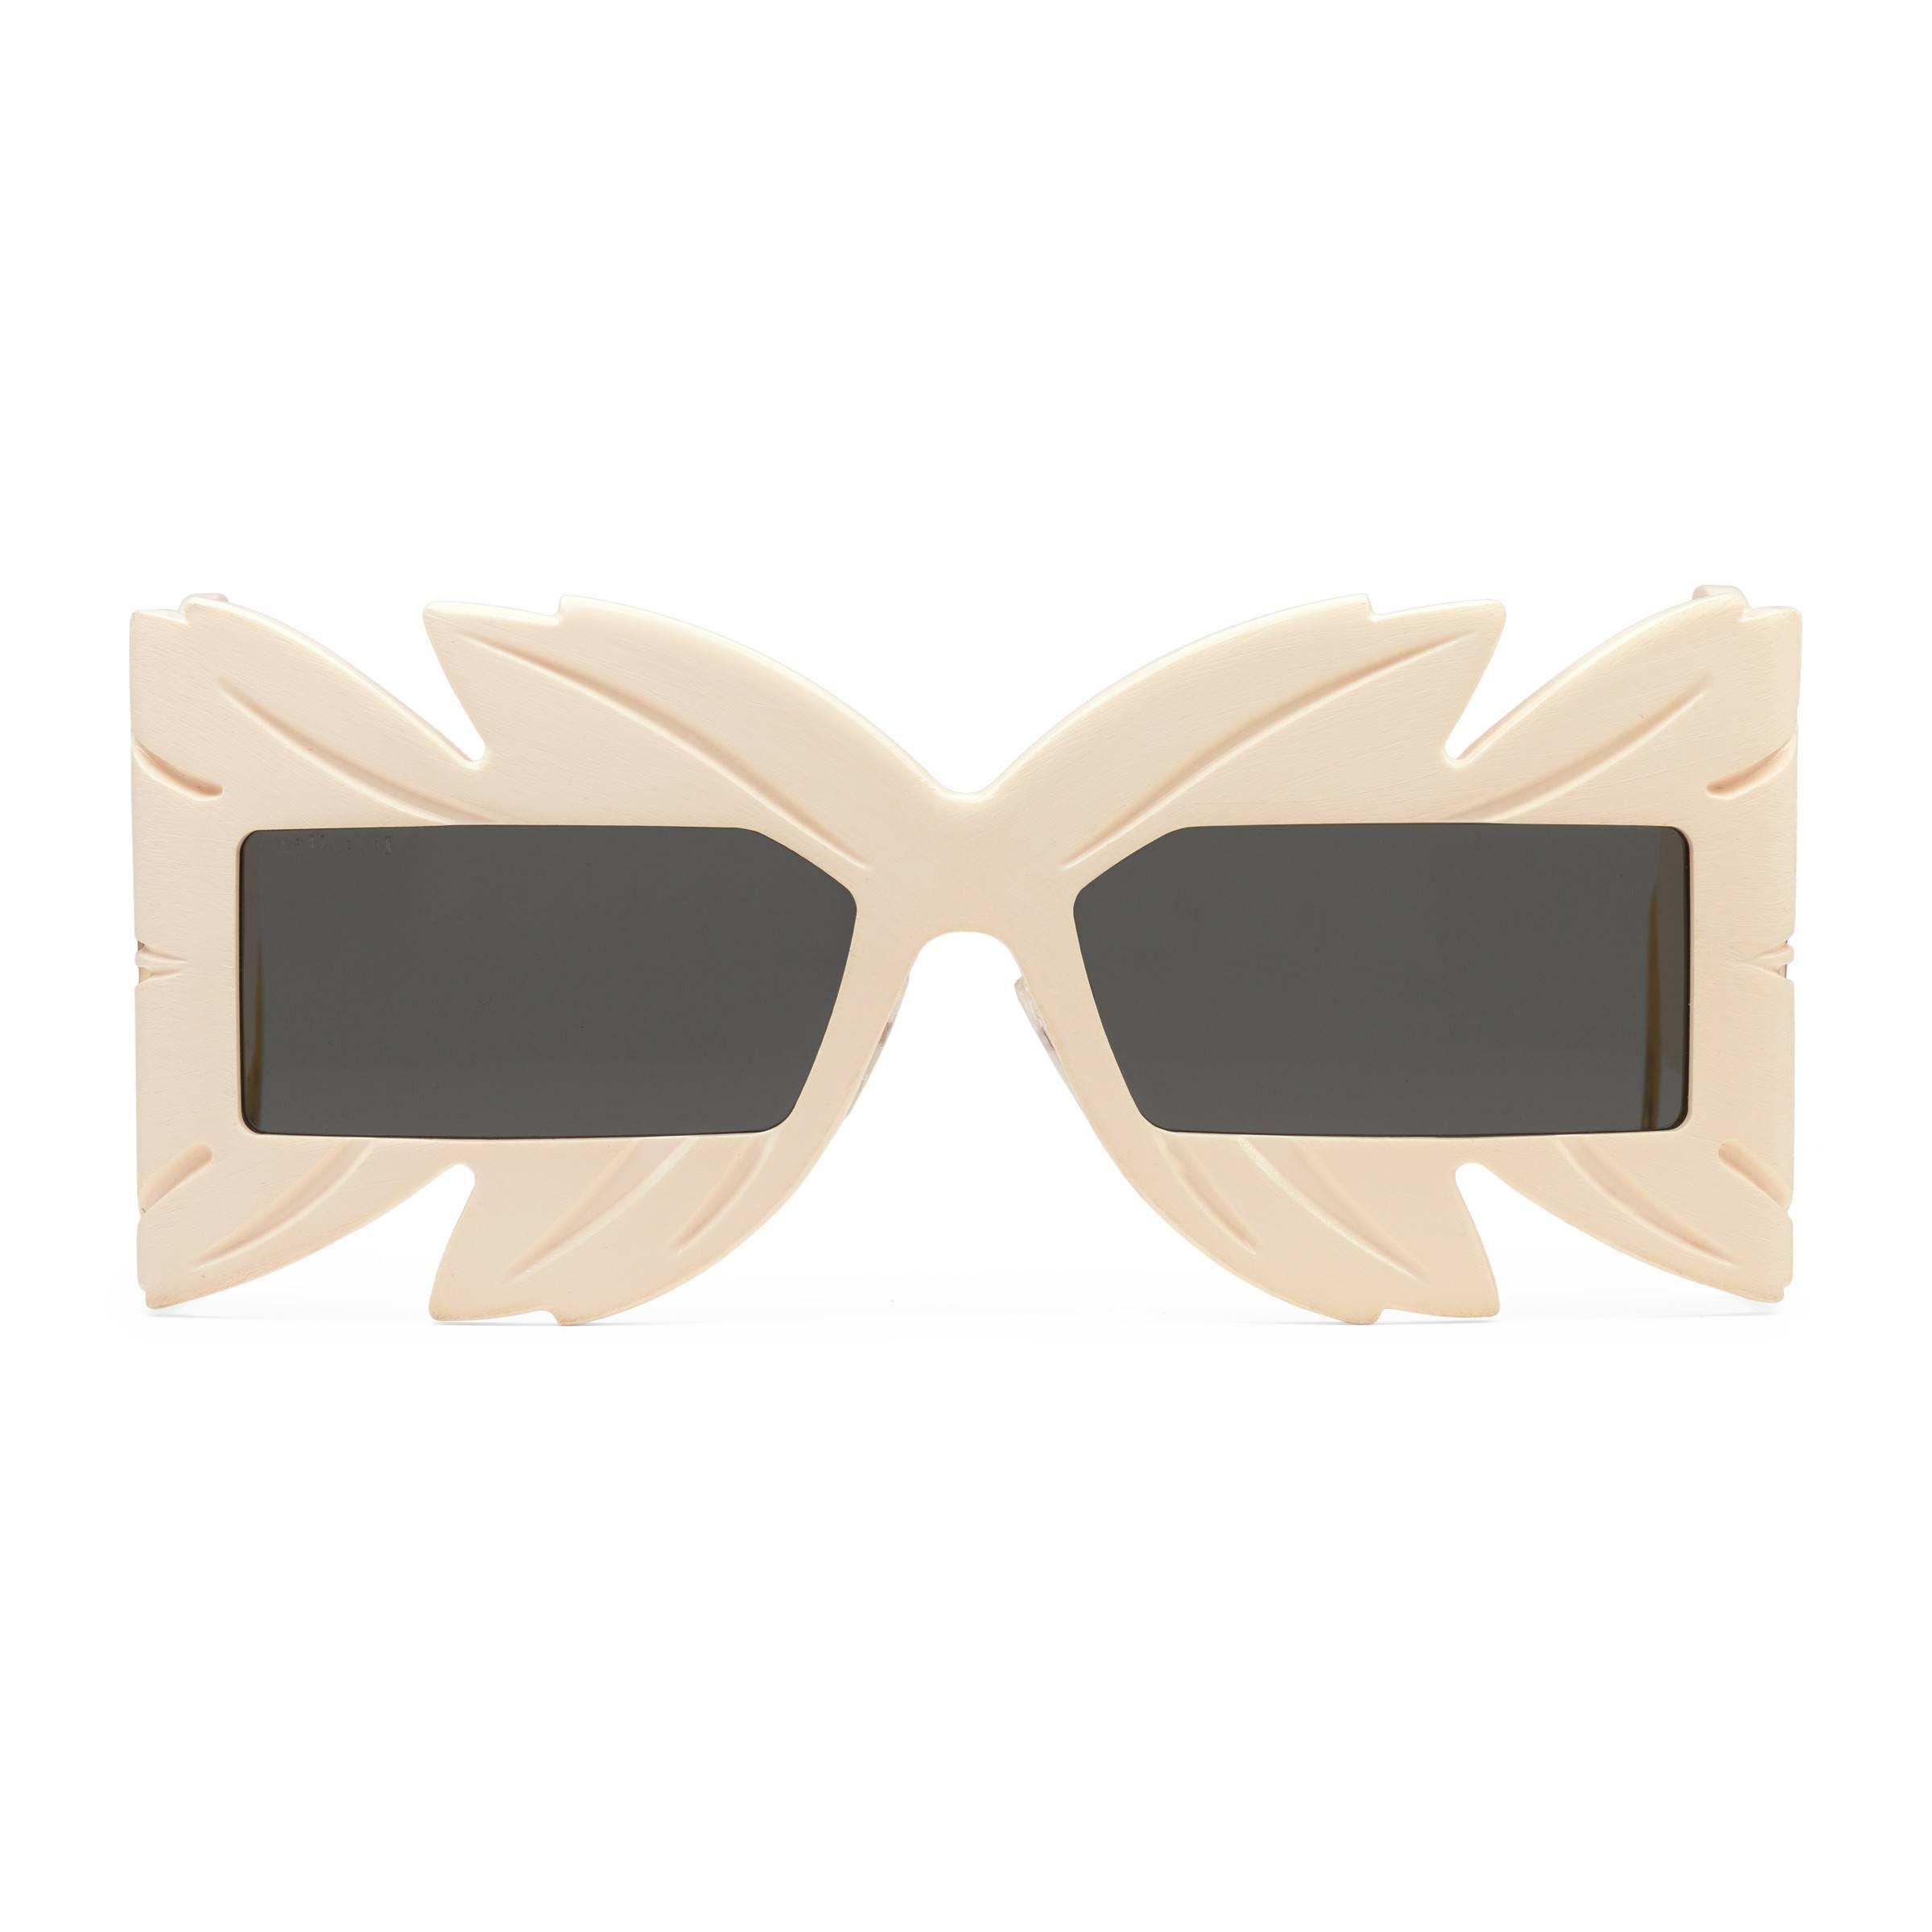 484a1f9ecbc Gucci Mask-frame Acetate Sunglasses - Save 5% - Lyst